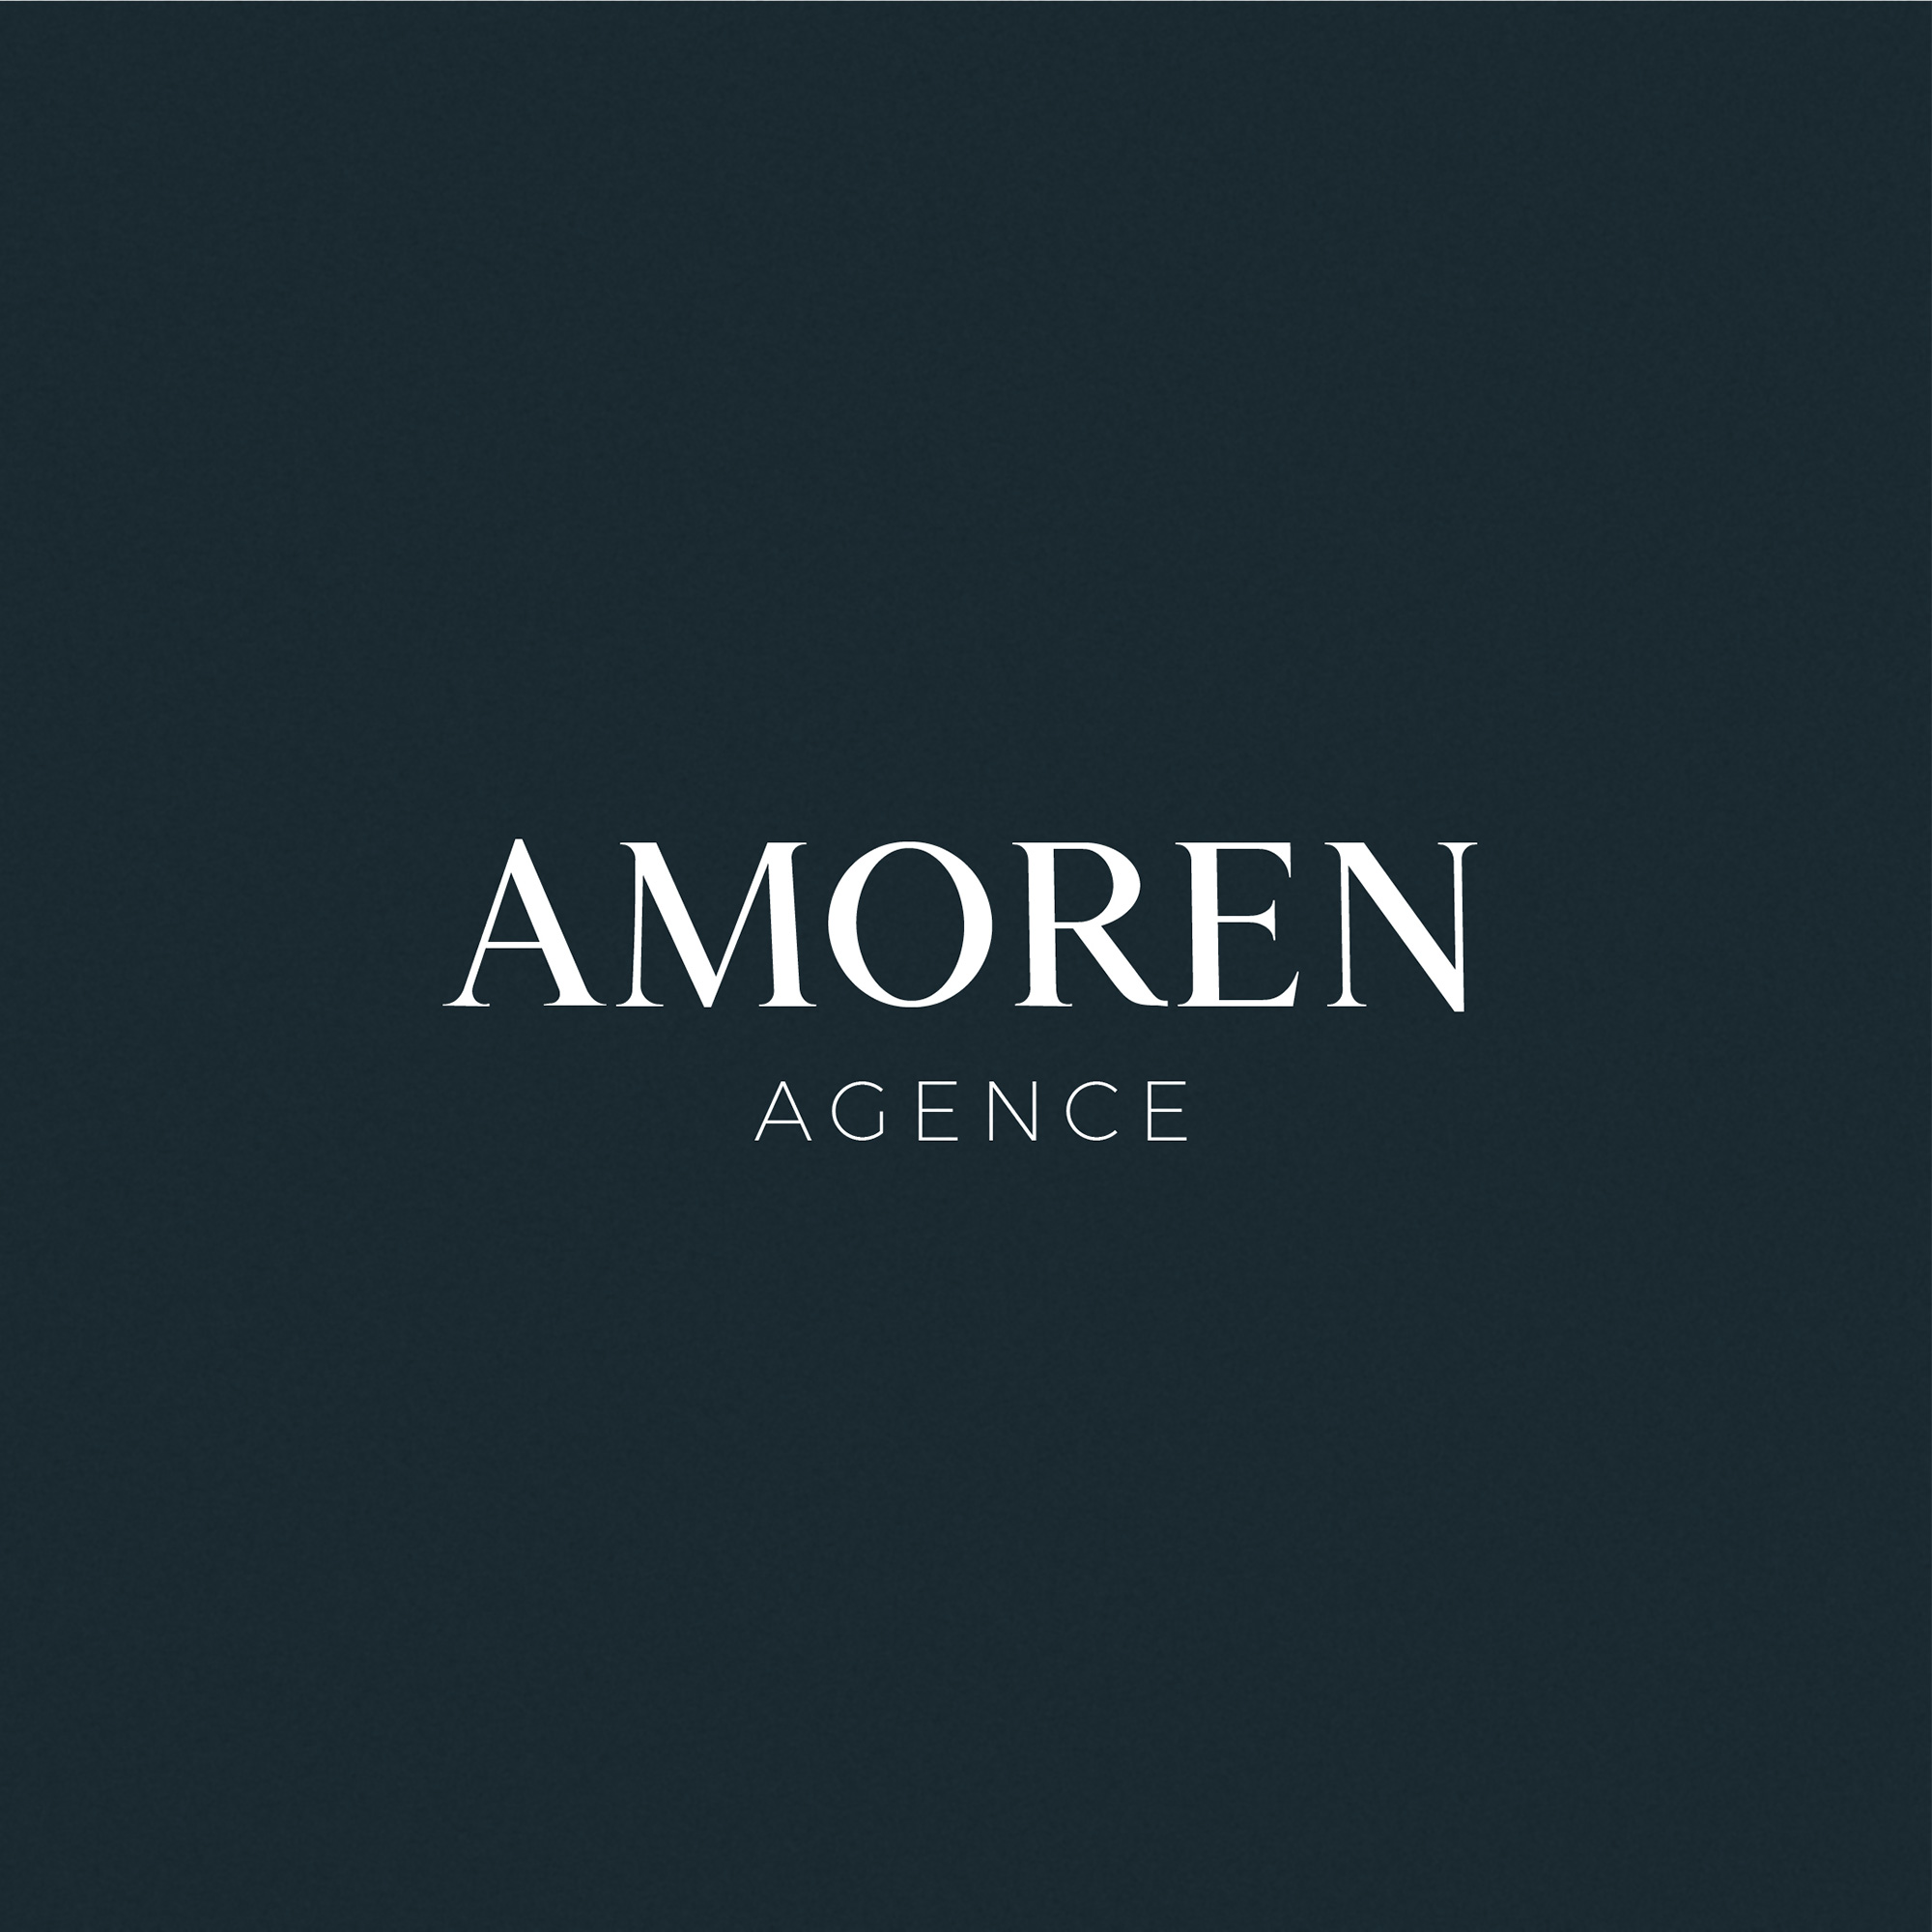 Logotype : refonte du logo de l'Agence Amoren